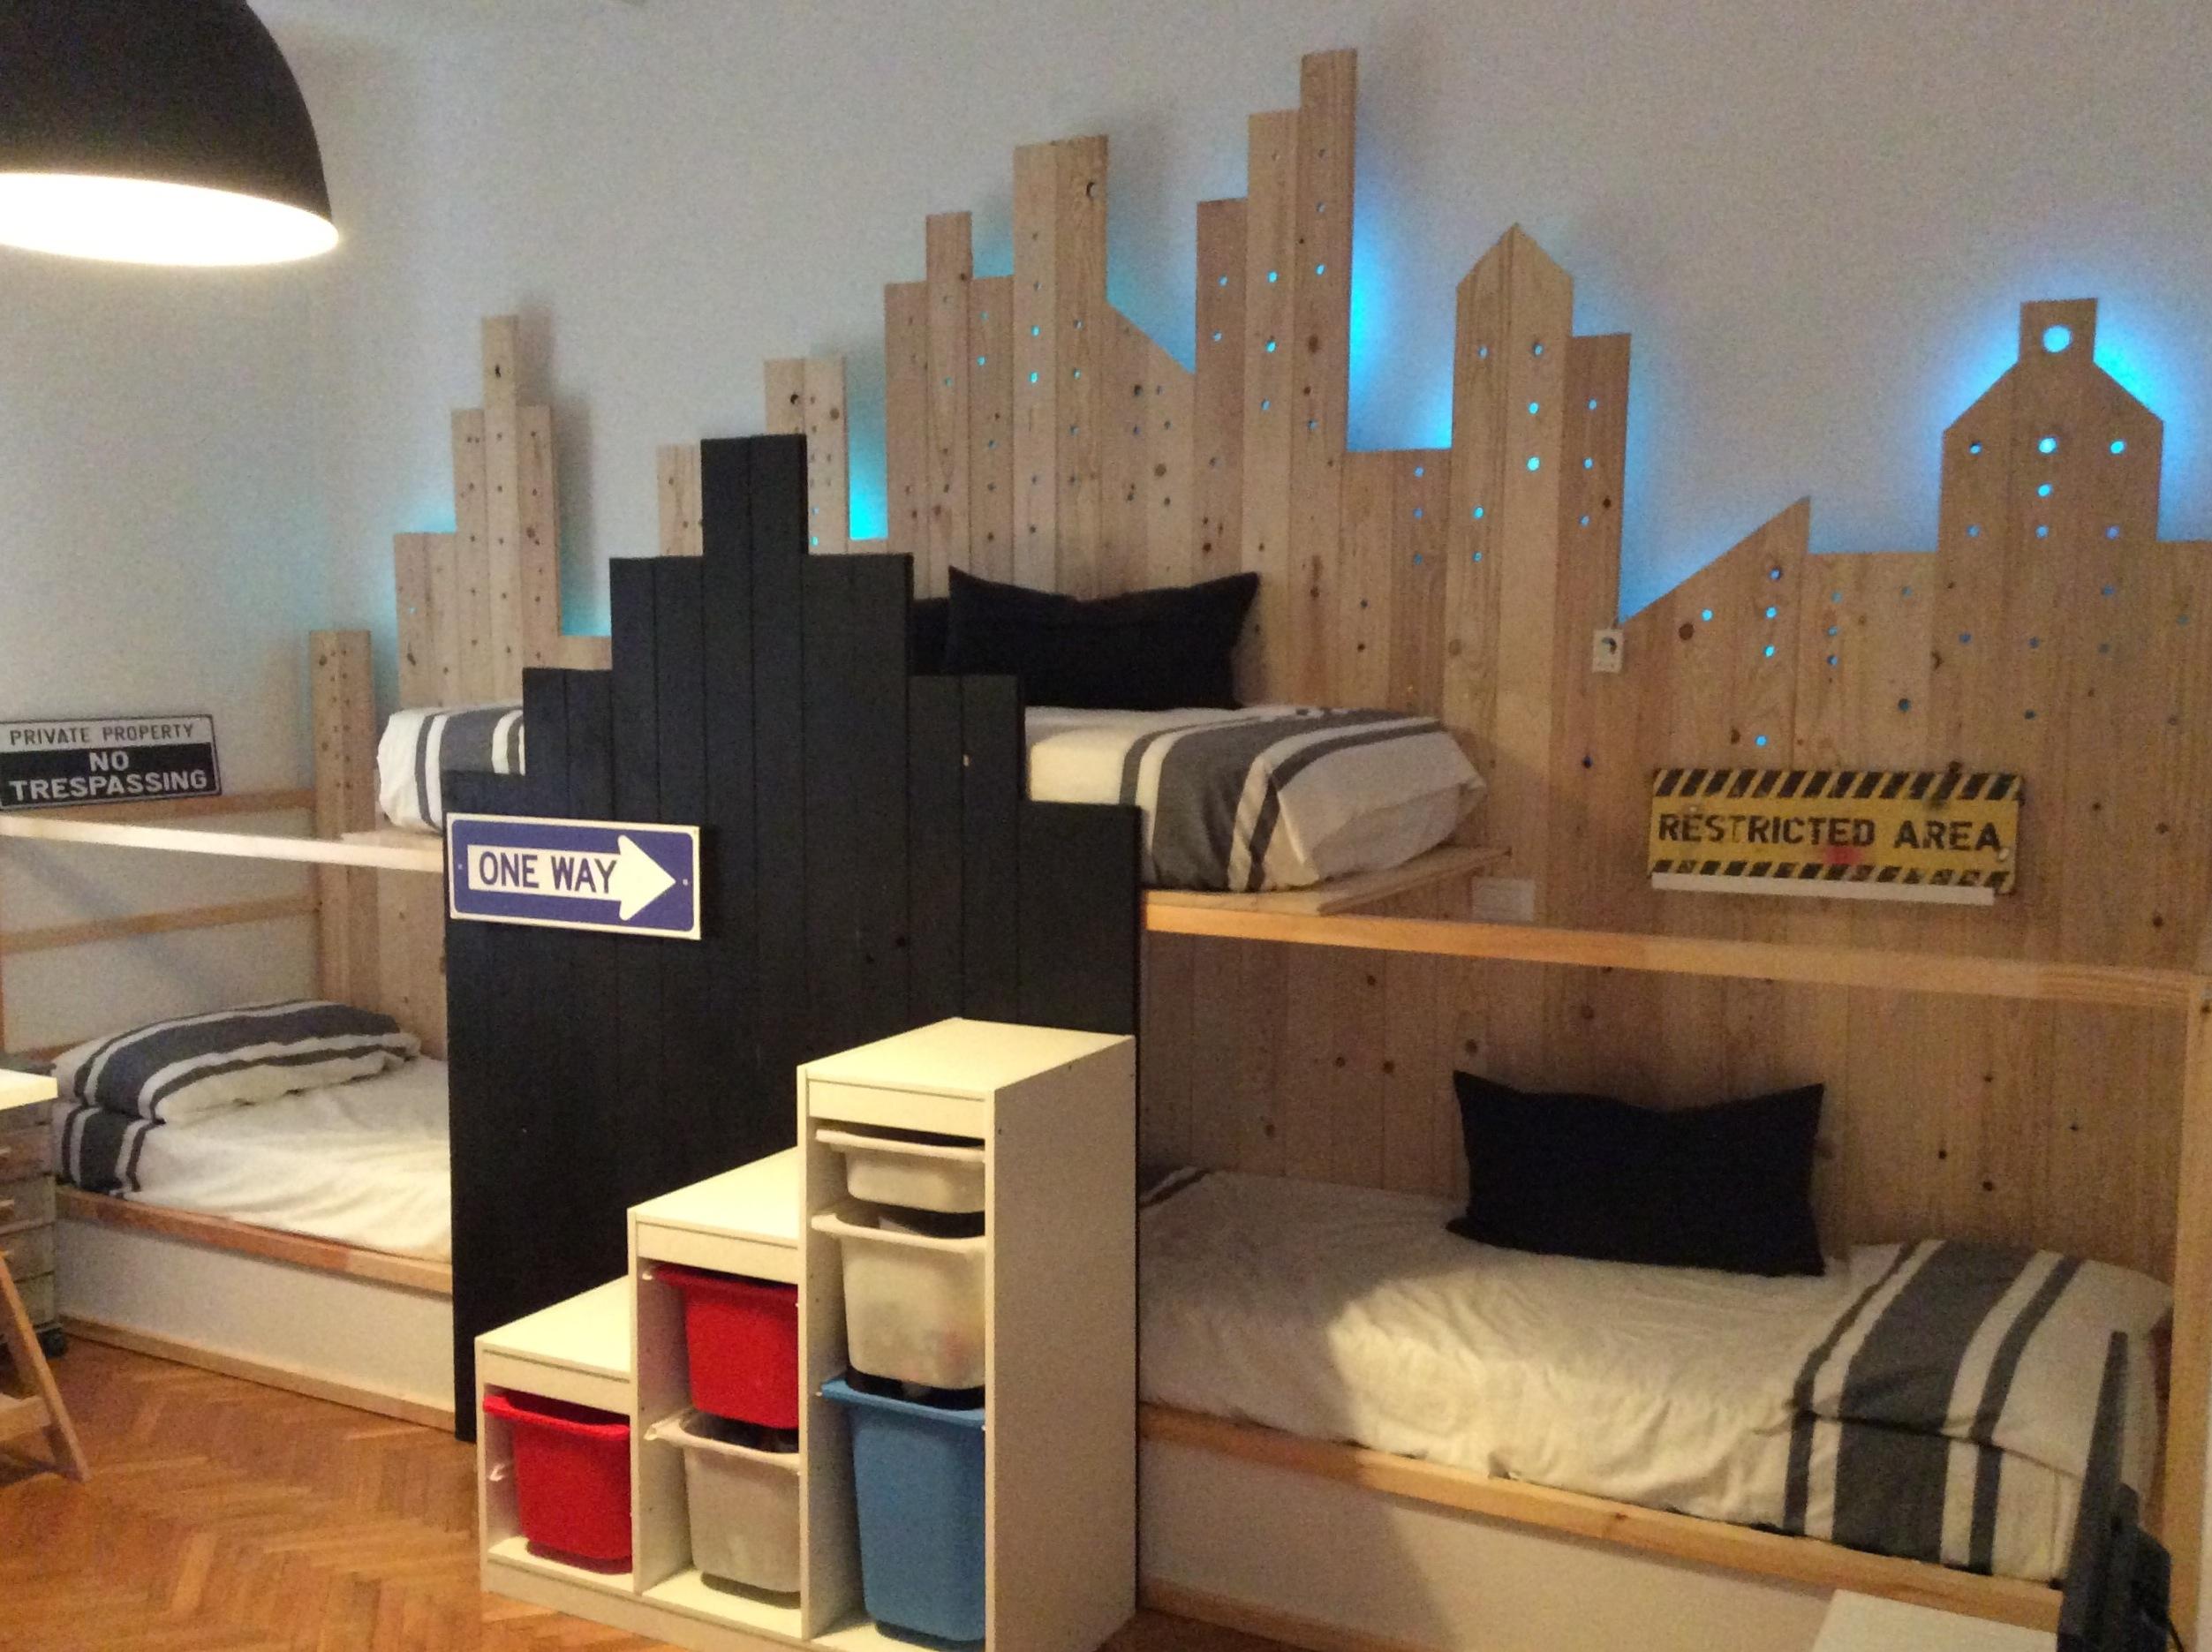 Full Size of Kura Hack Ikea 2 Beds Storage Bed Montessori Slide Stairs House Double Bunk Instructions Wohnzimmer Kura Hack